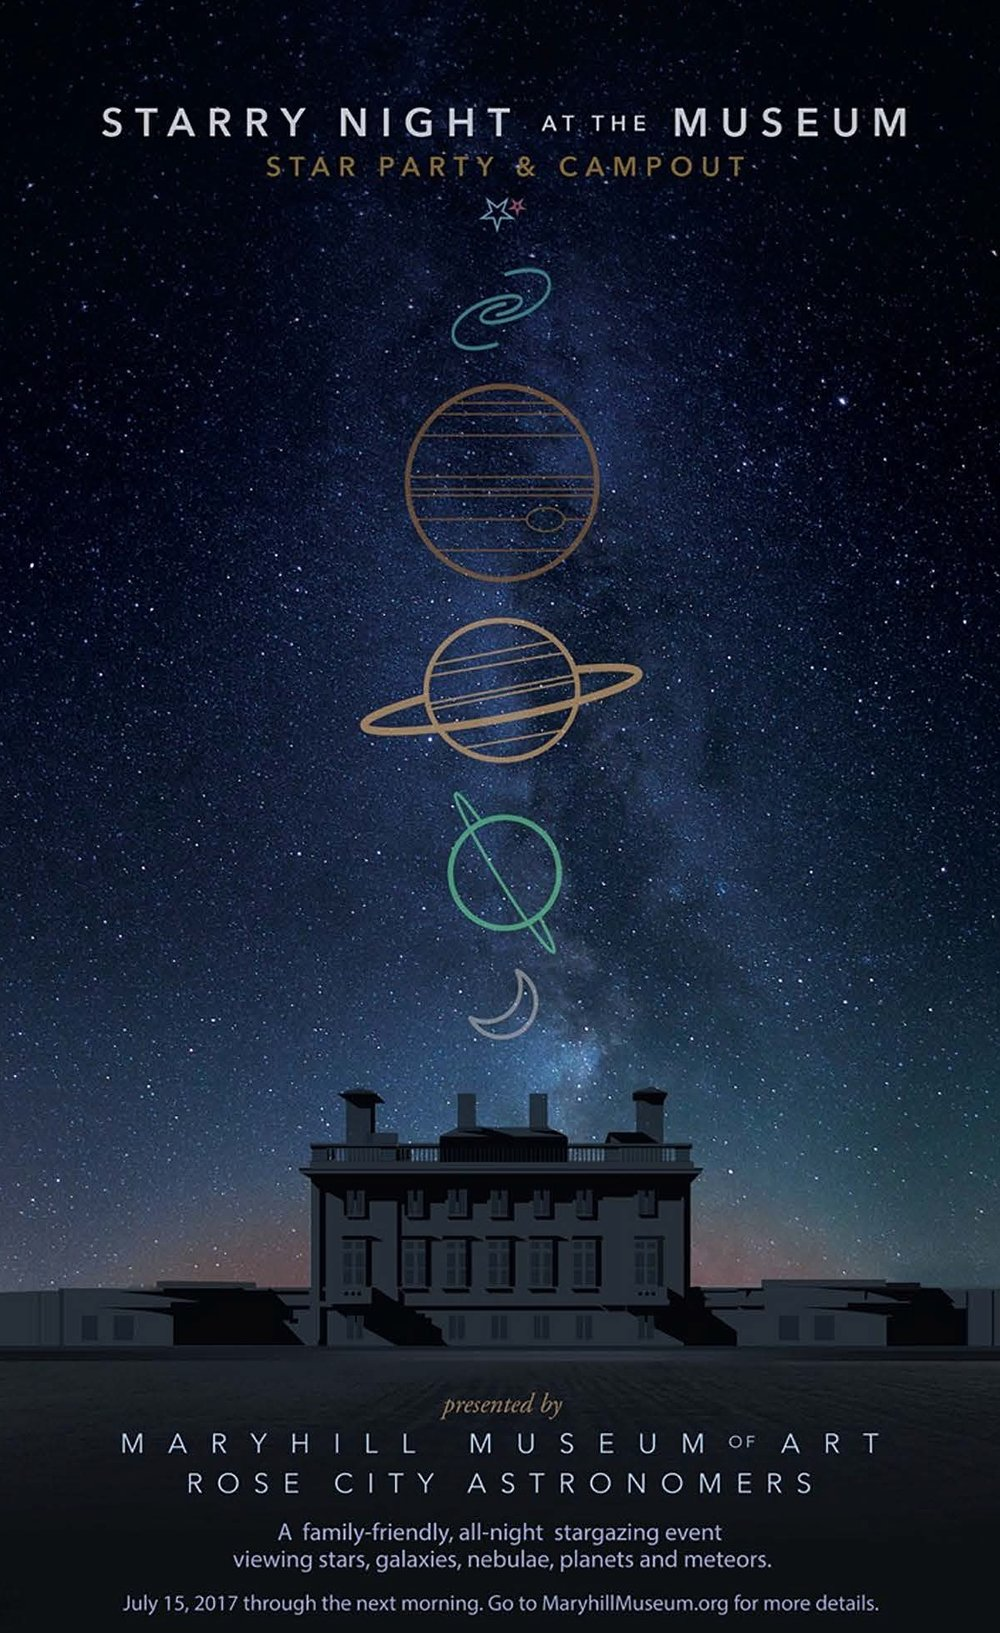 Starry-Night-at-Maryhill-Museum-2017.jpg